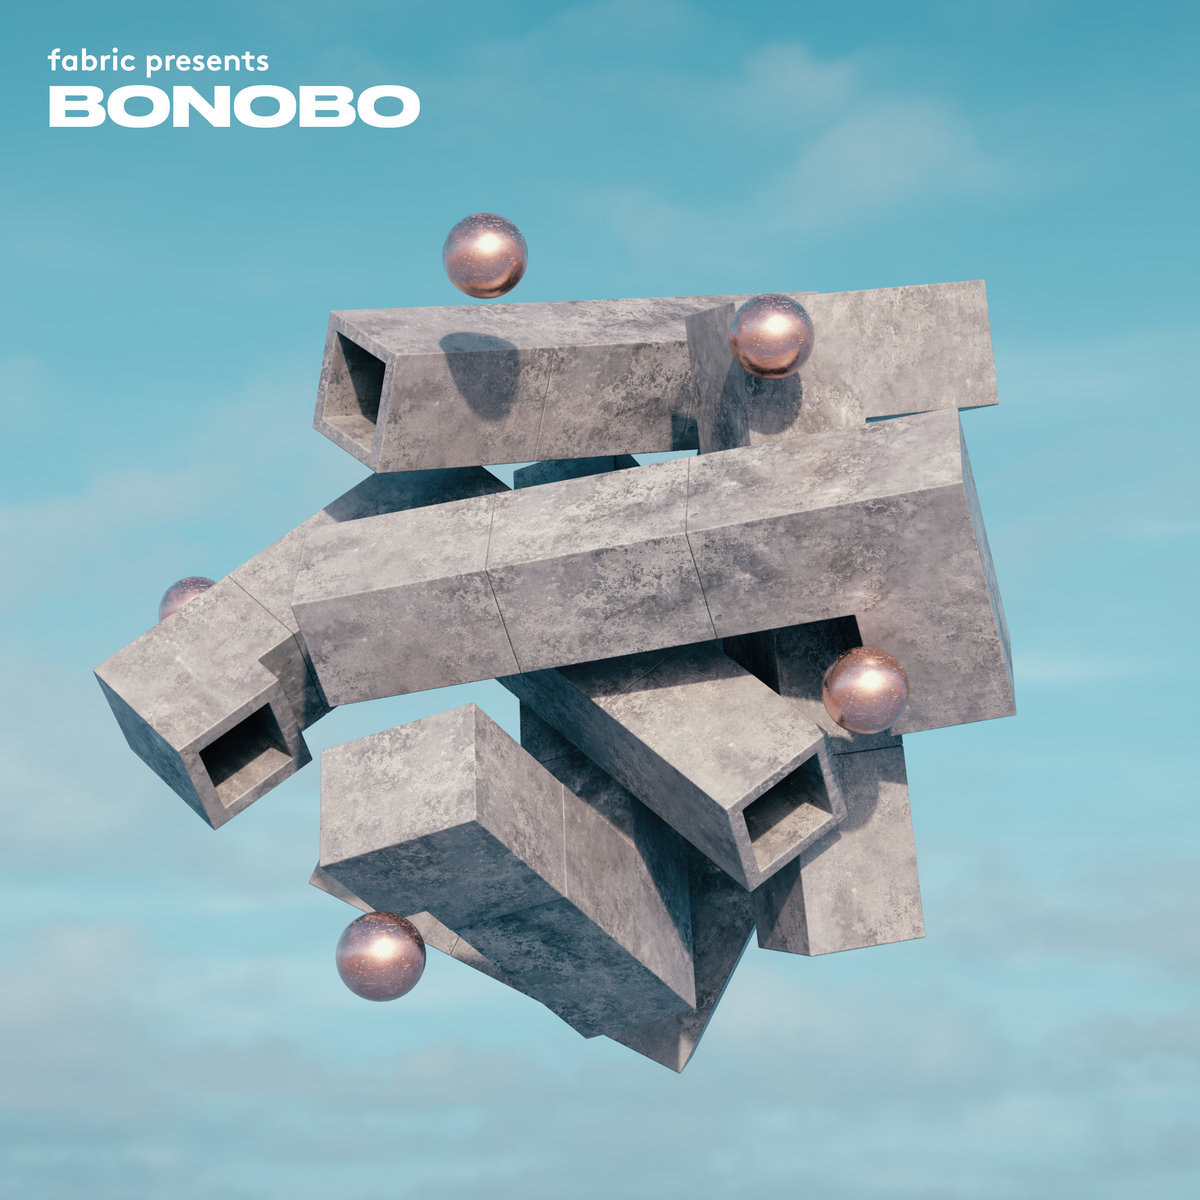 fabric-presents-bonobo.jpg